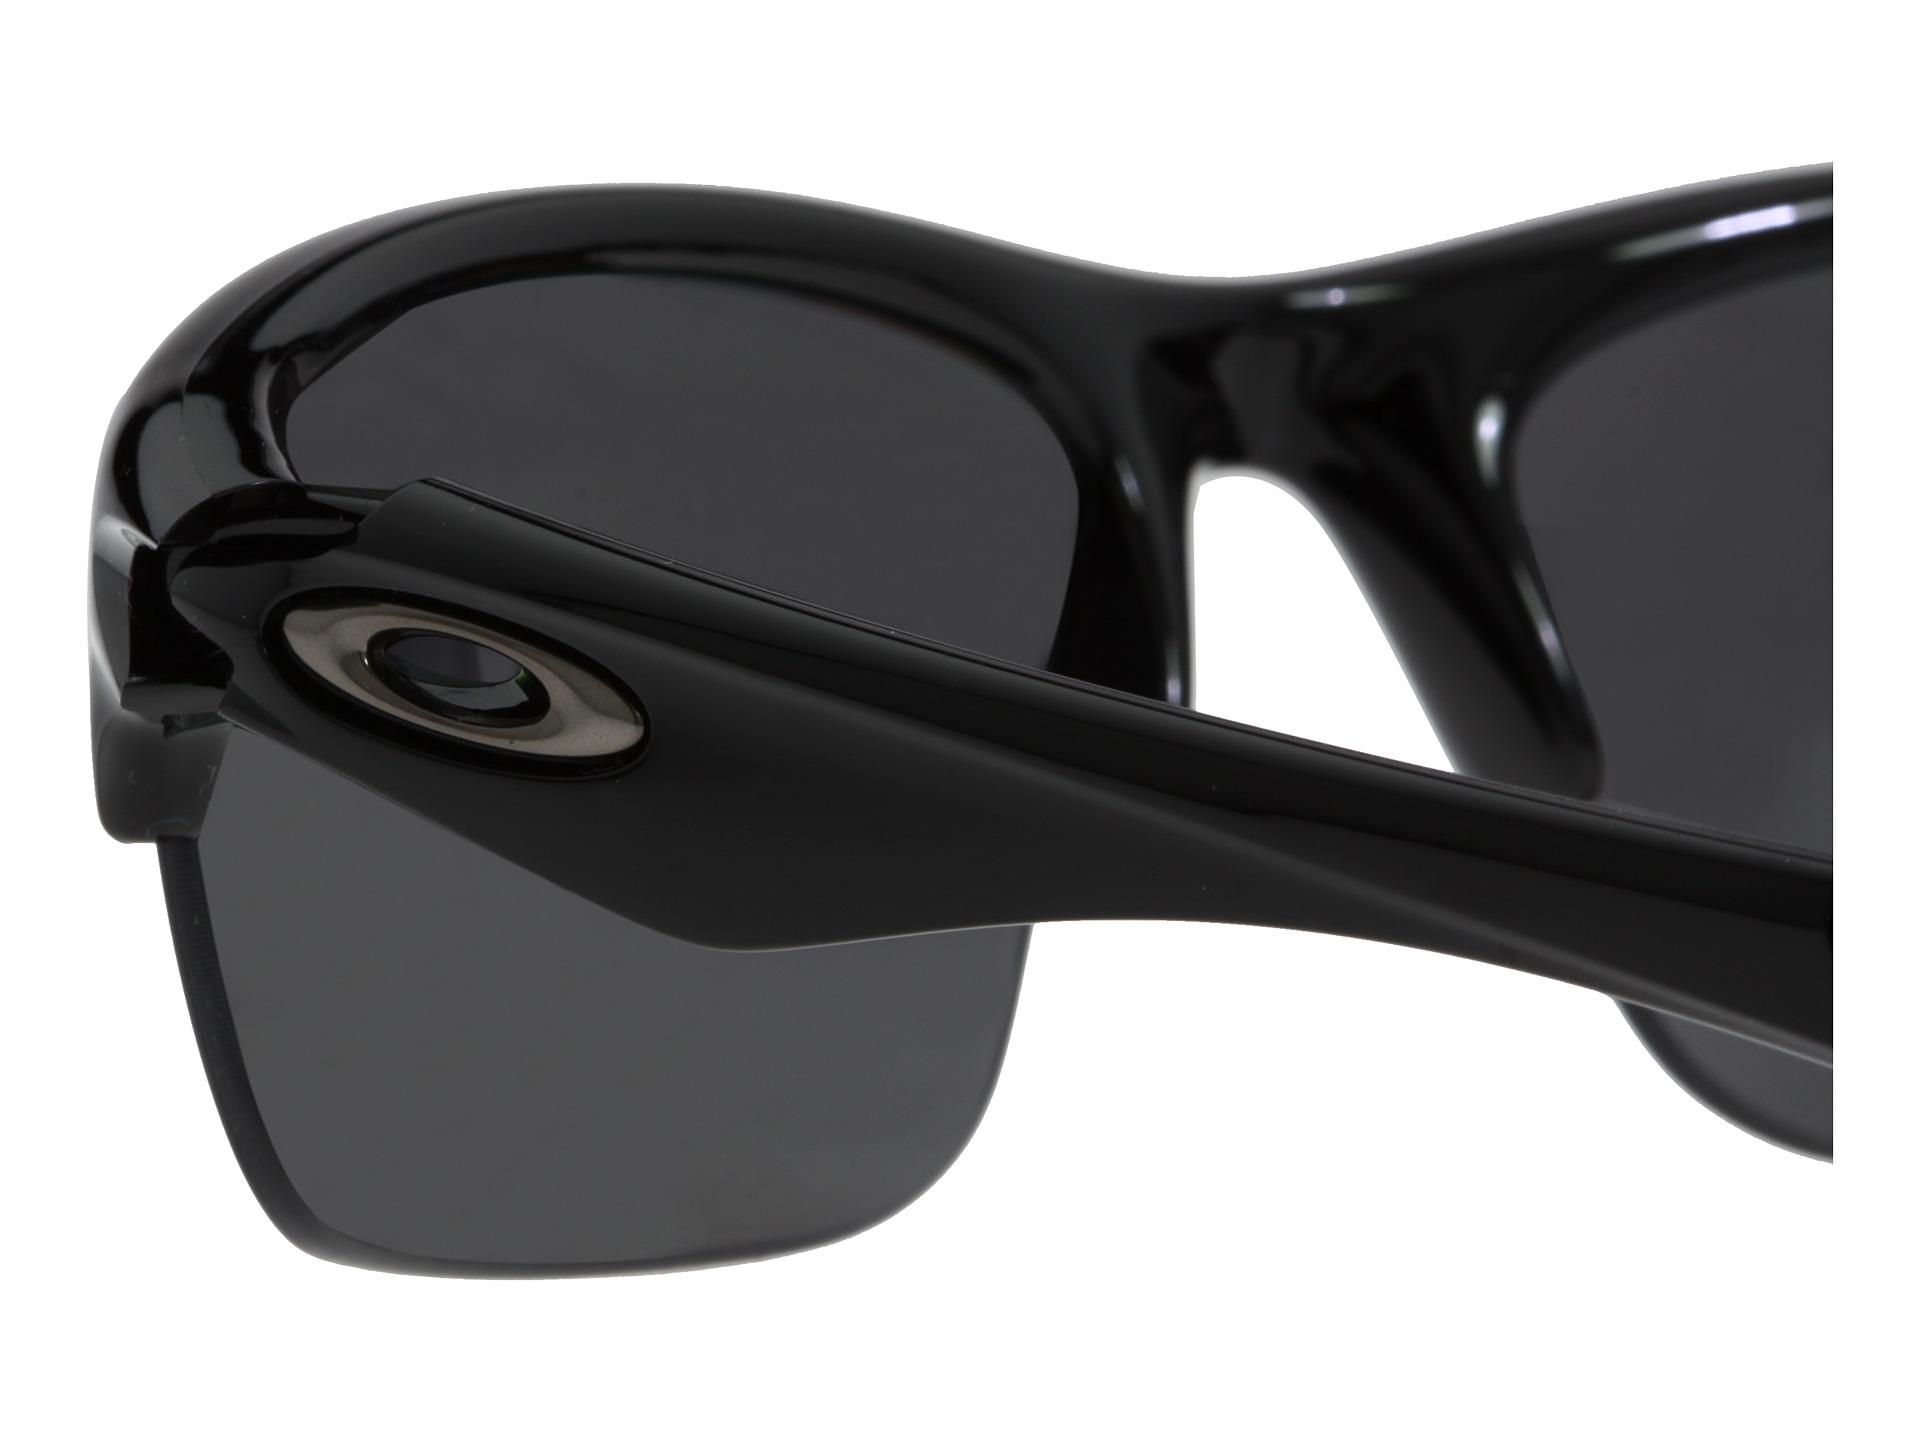 oakley ansi approved safety glasses pnp8  Video